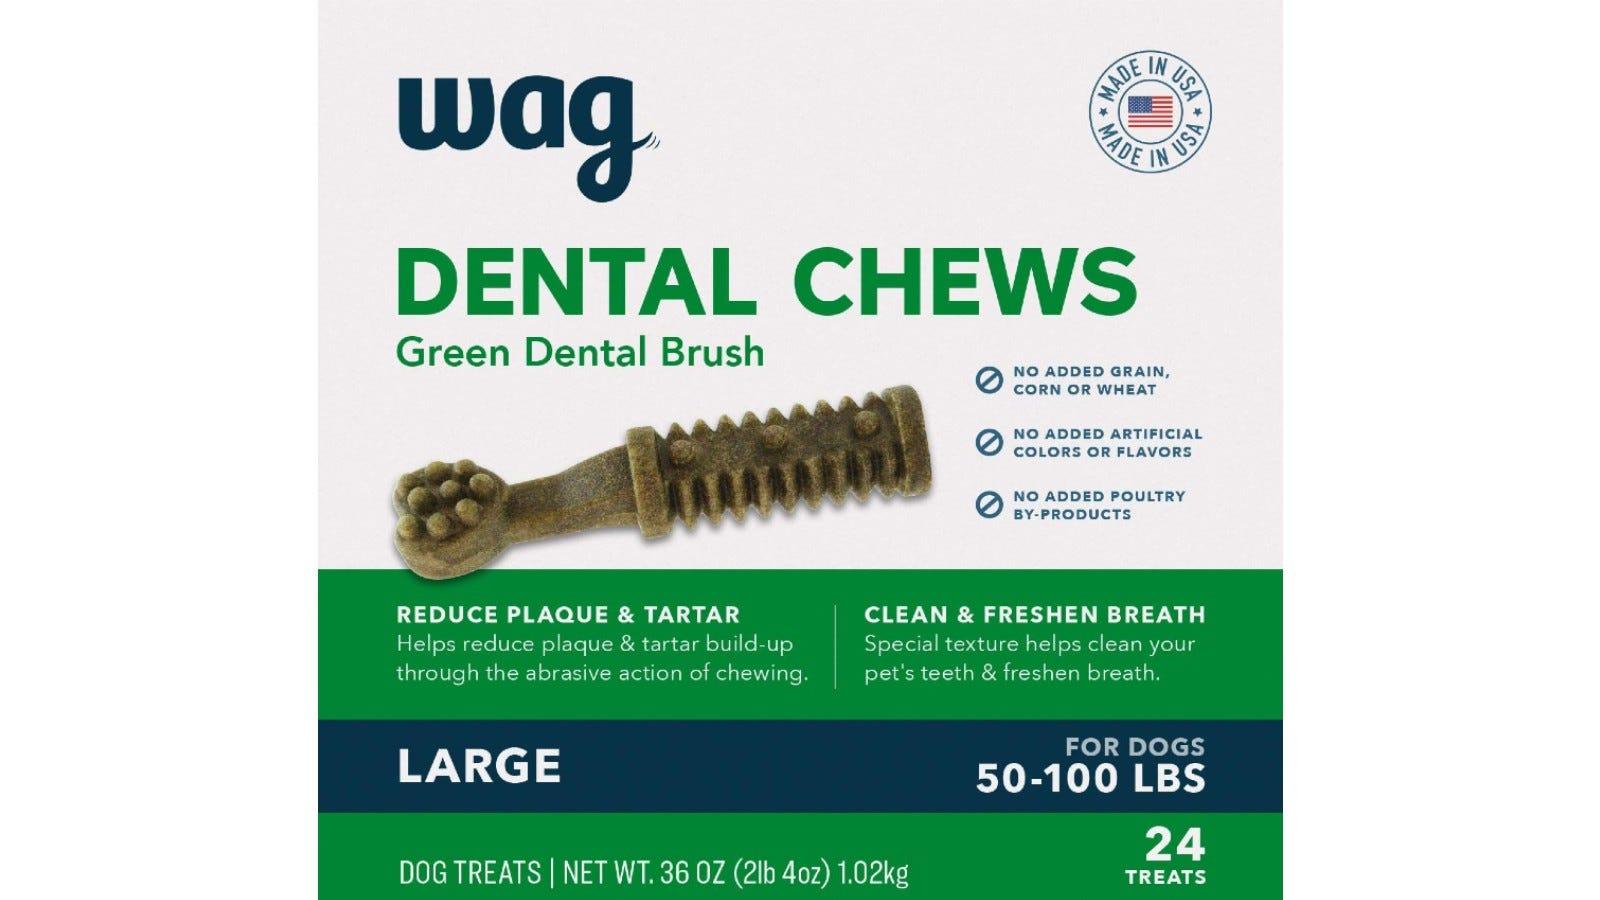 Dog treats that promote good dental hygiene